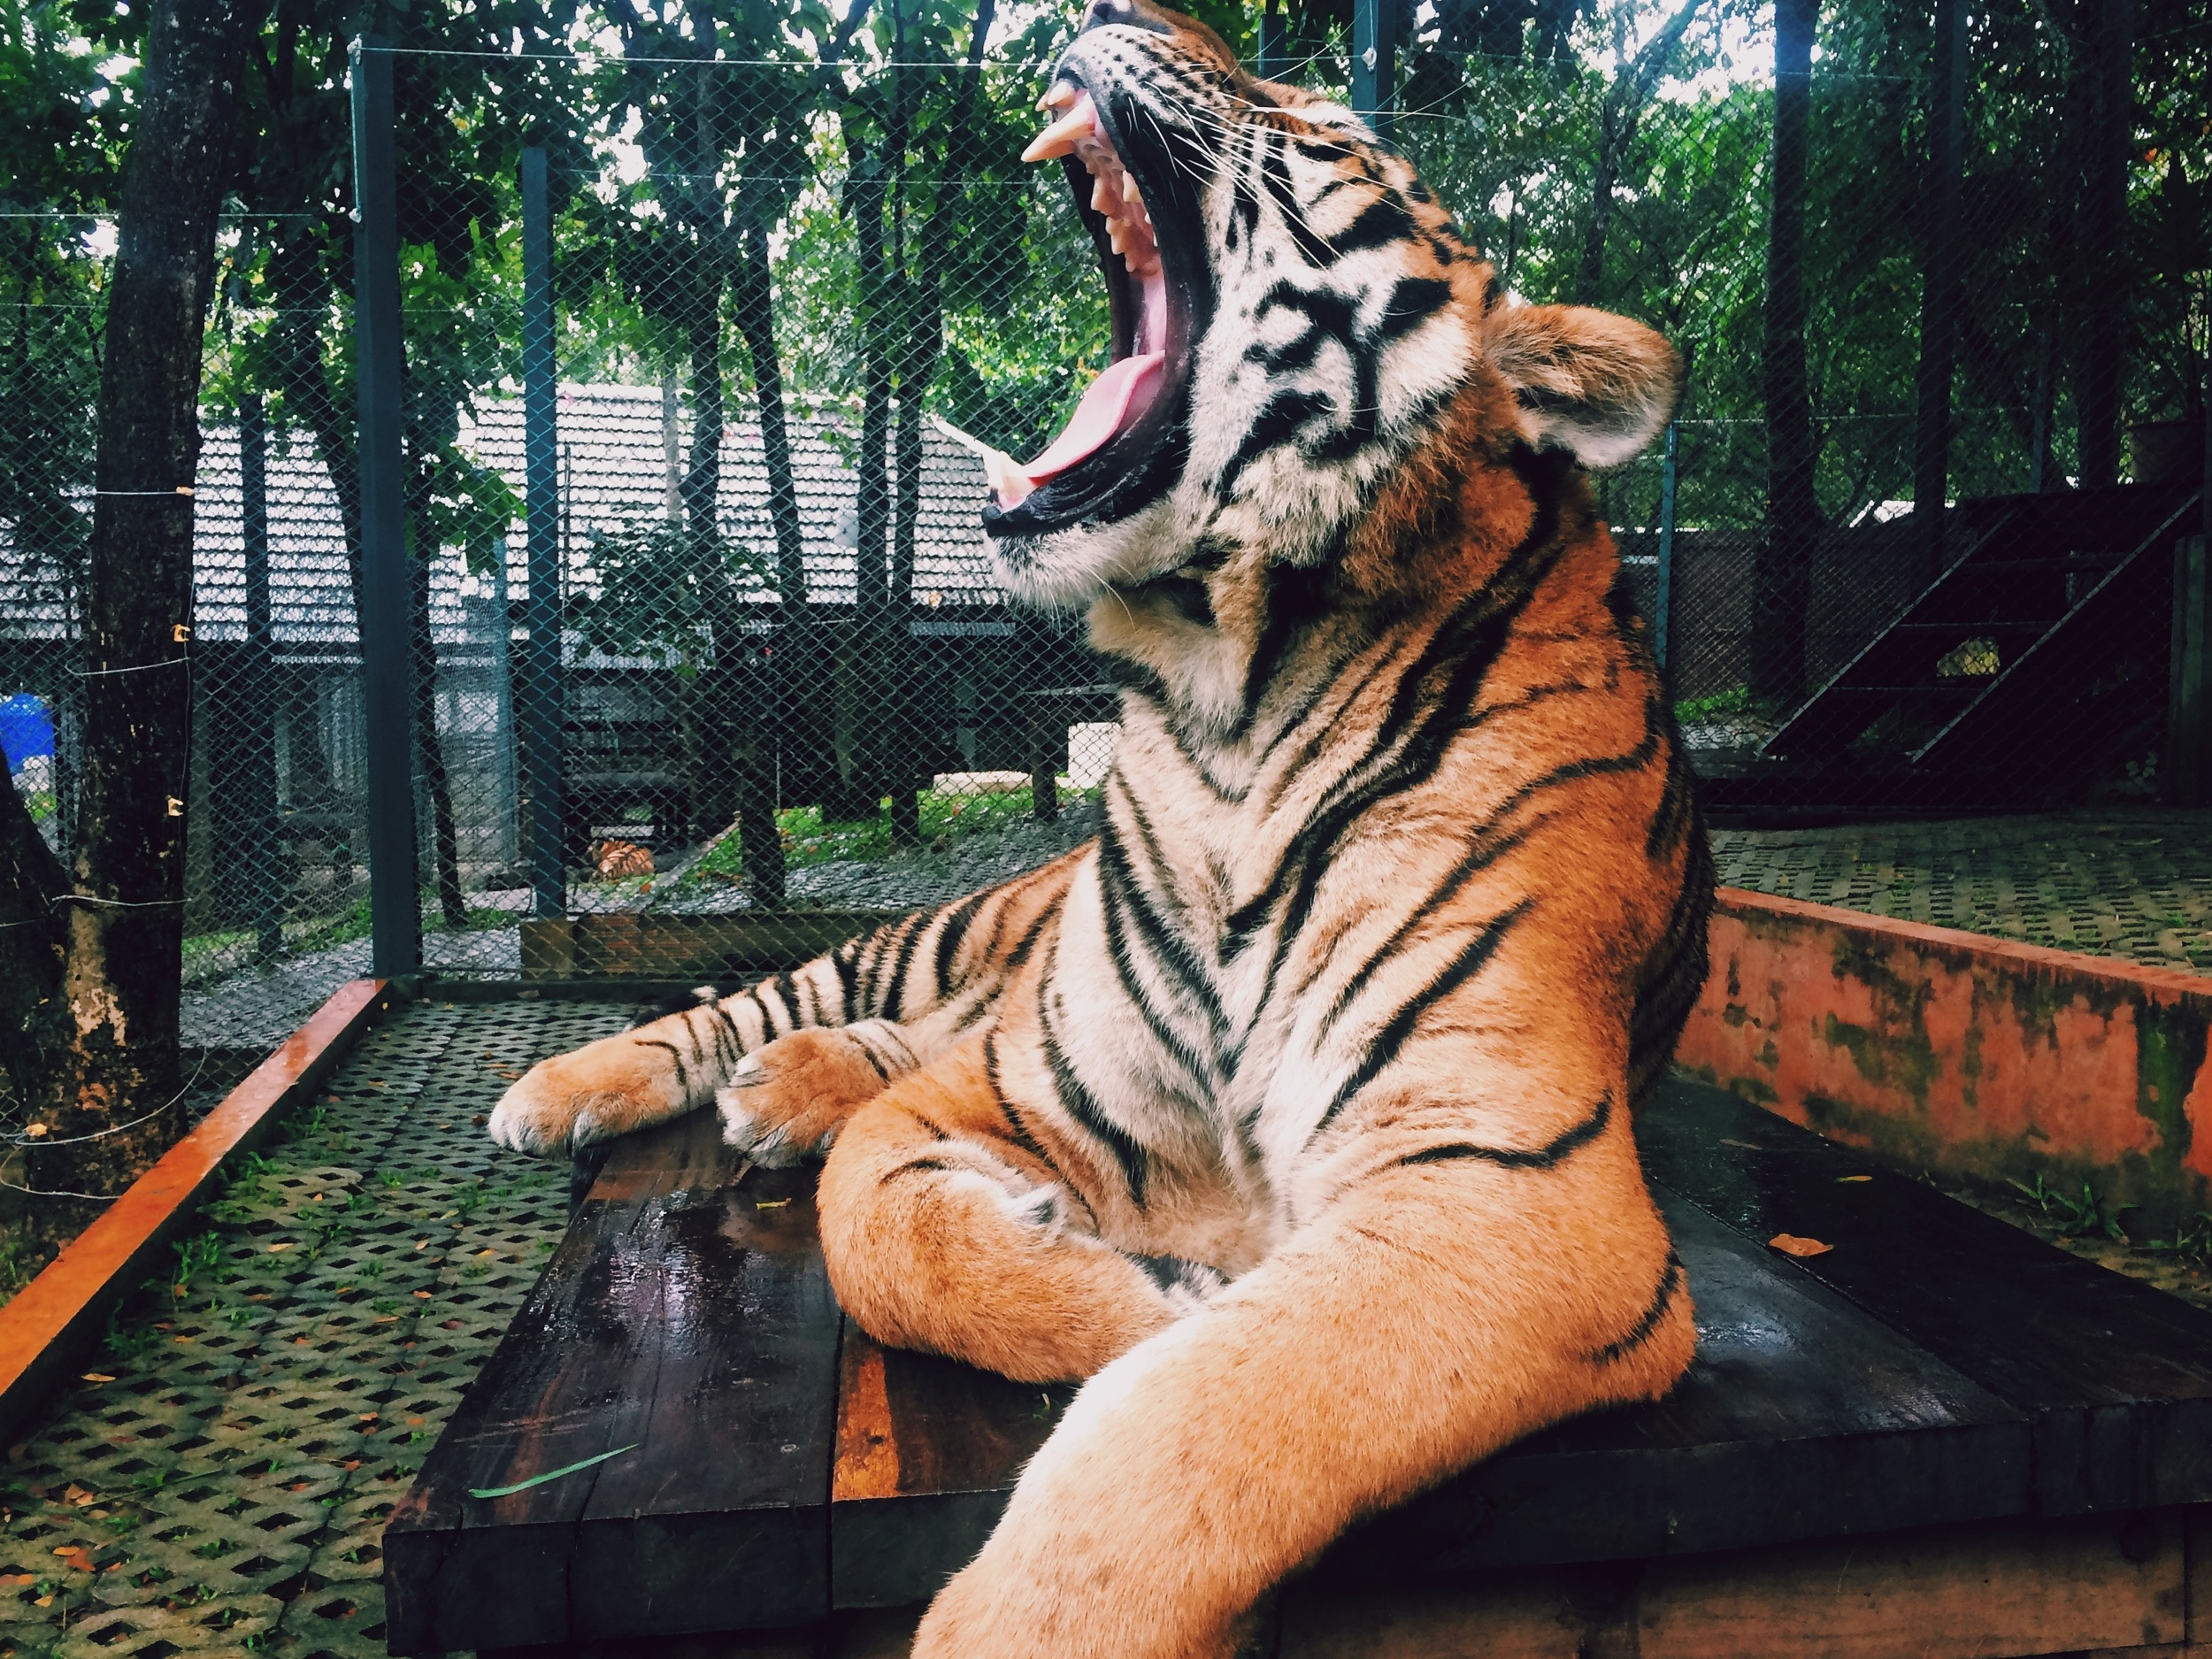 paul borowska tiger 2of 3 Up cW.jpeg